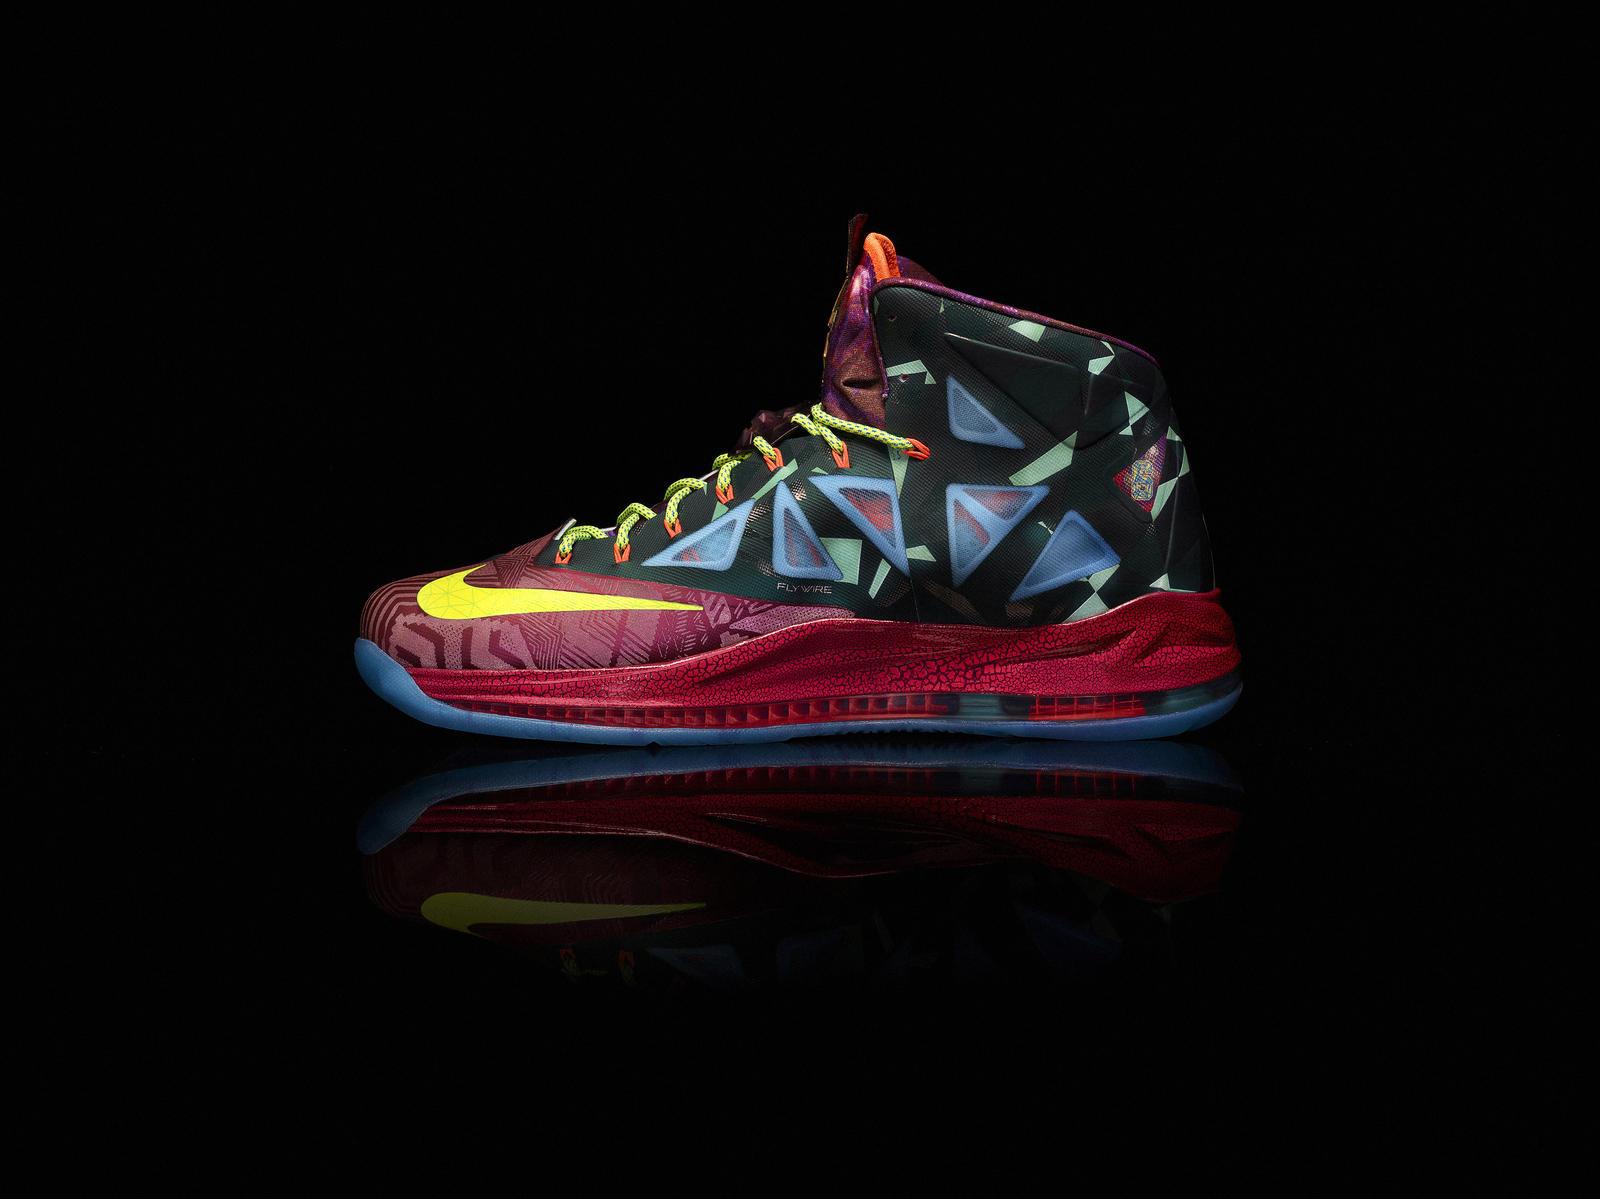 Most Valuable Basketball Shoe